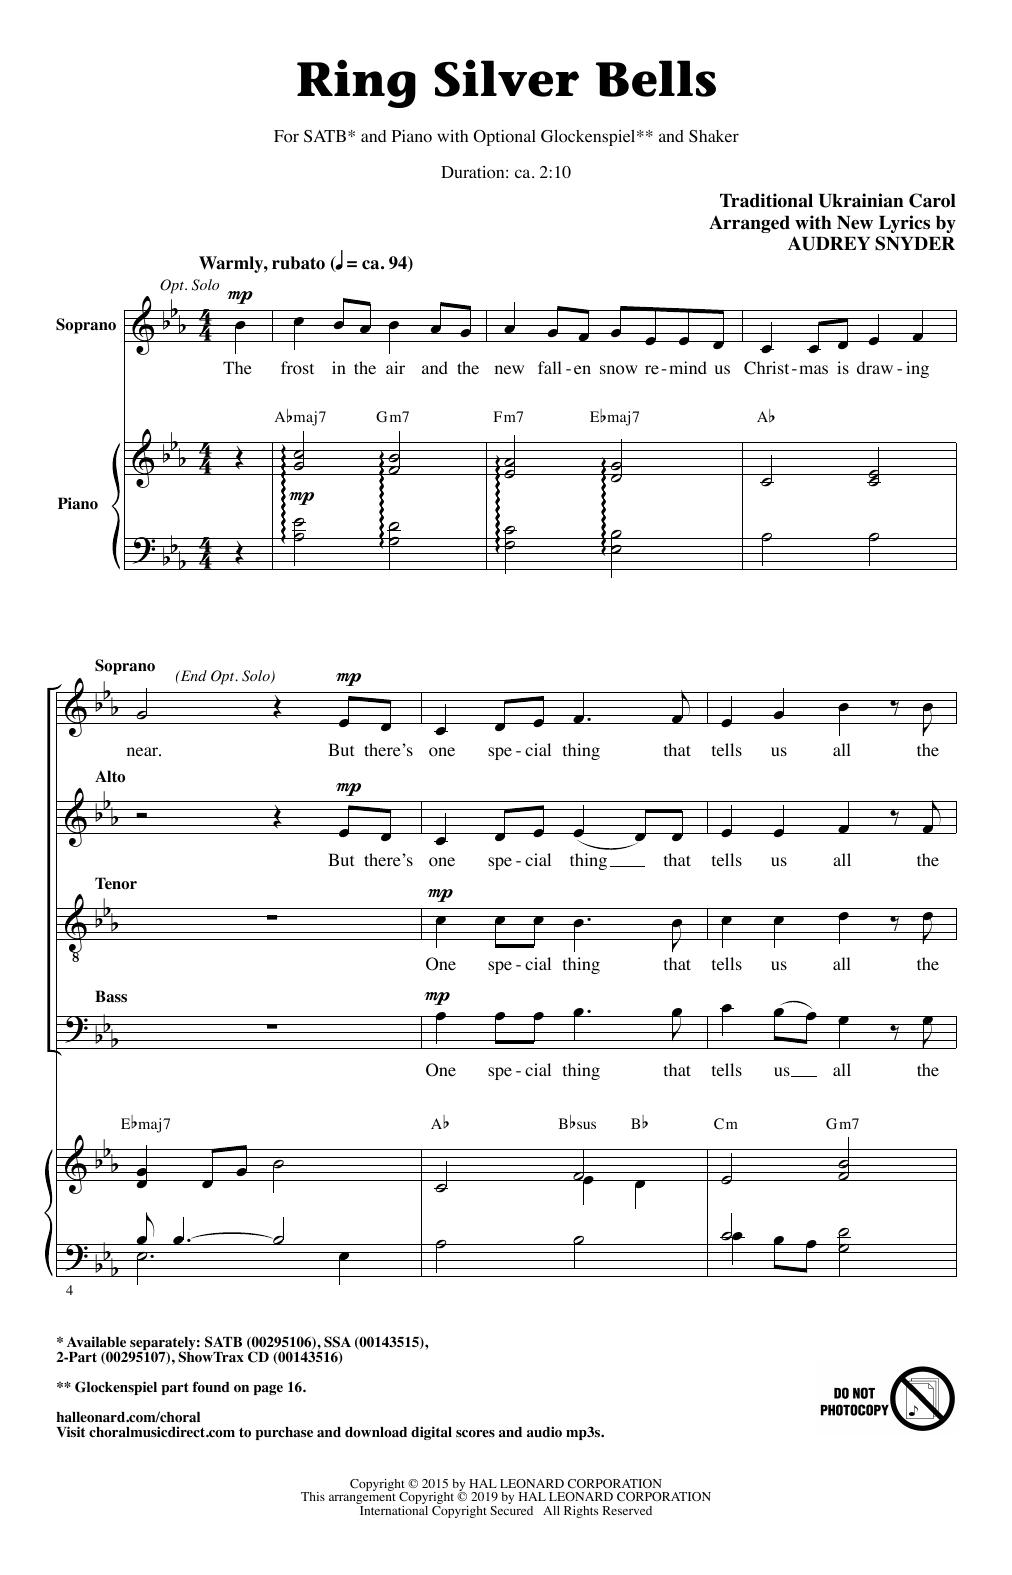 Ring Silver Bells (arr. Audrey Snyder) (SATB Choir)